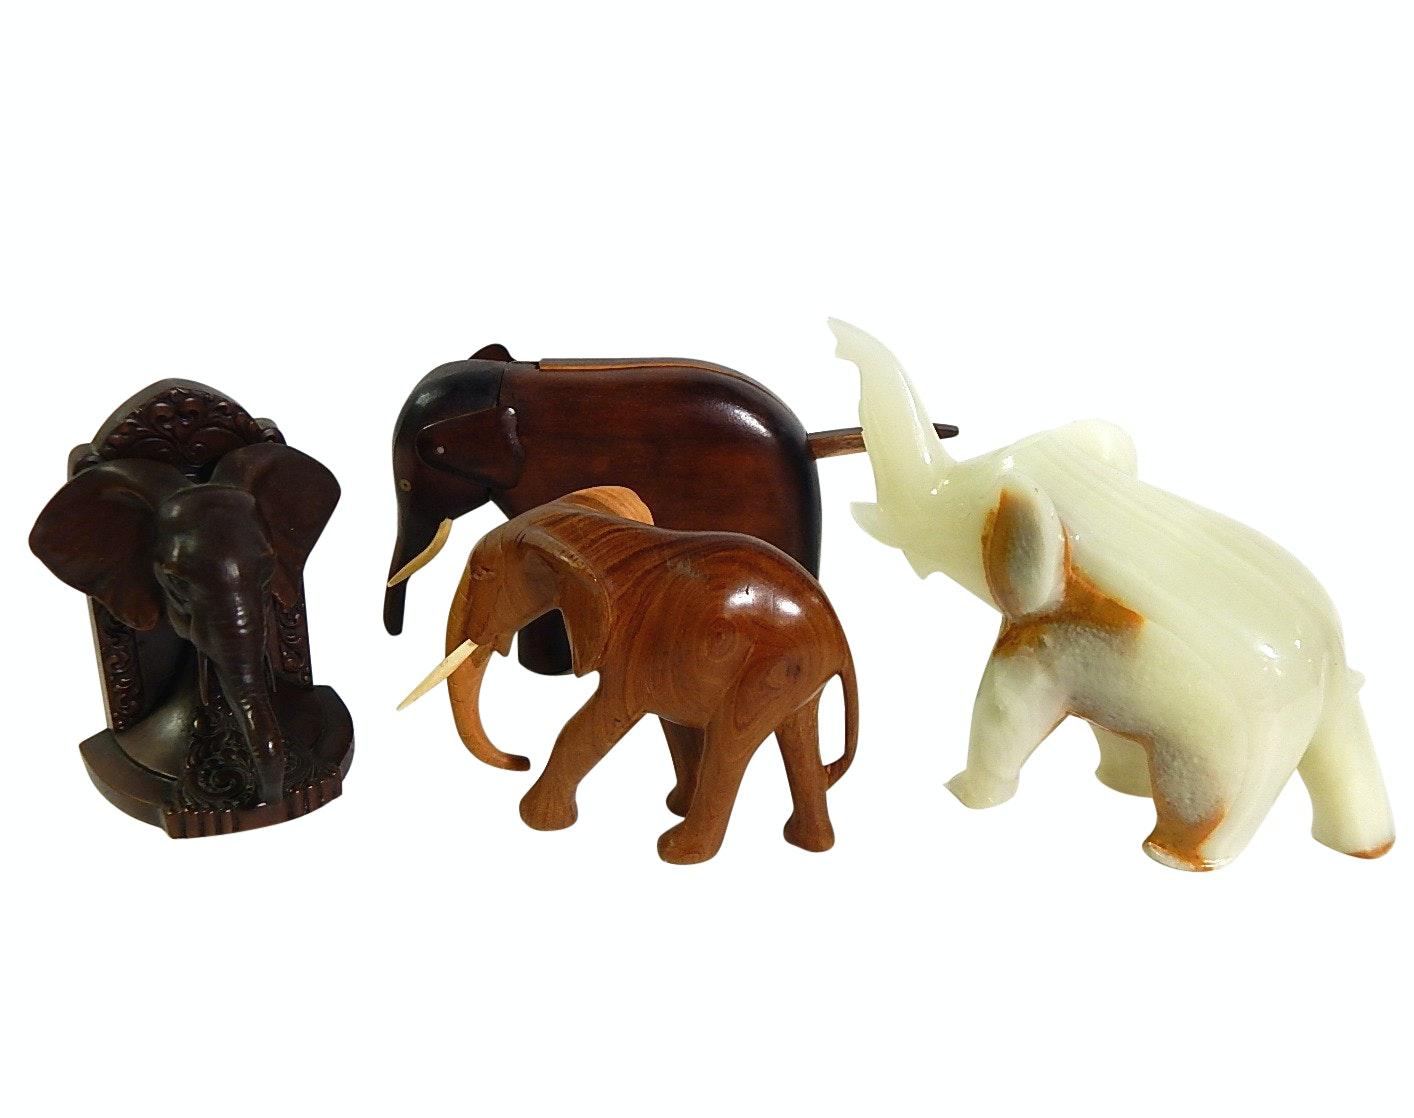 Elephant Figurine Collection